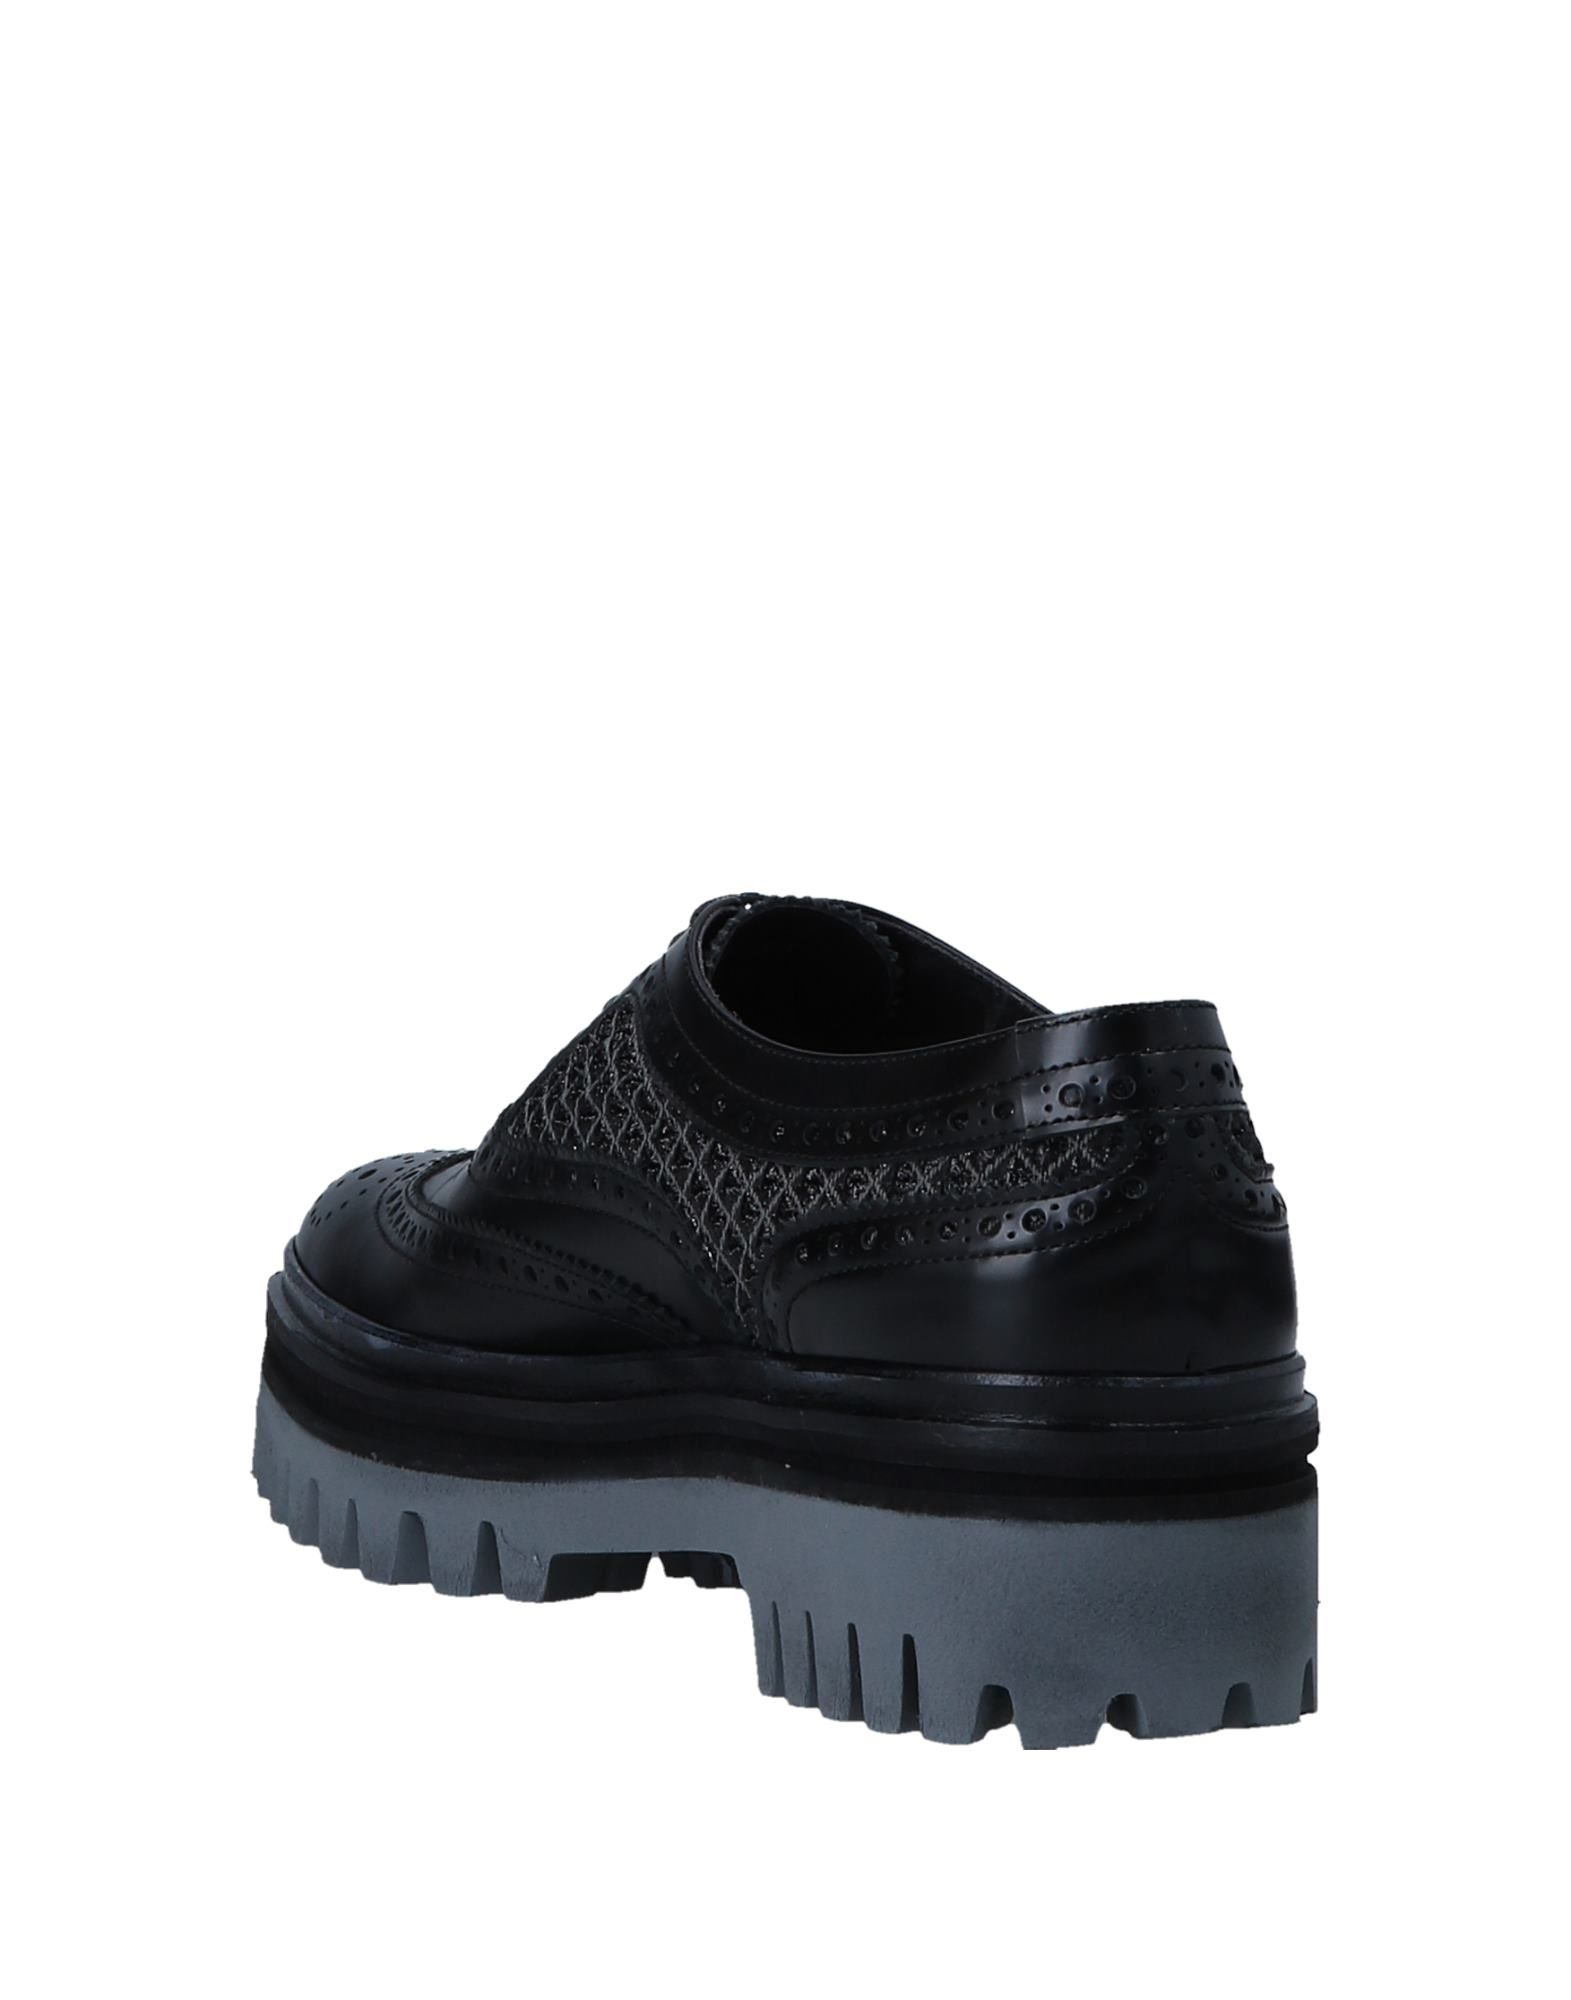 Alberto 11560931JXGut Guardiani Schnürschuhe Damen  11560931JXGut Alberto aussehende strapazierfähige Schuhe b5288f